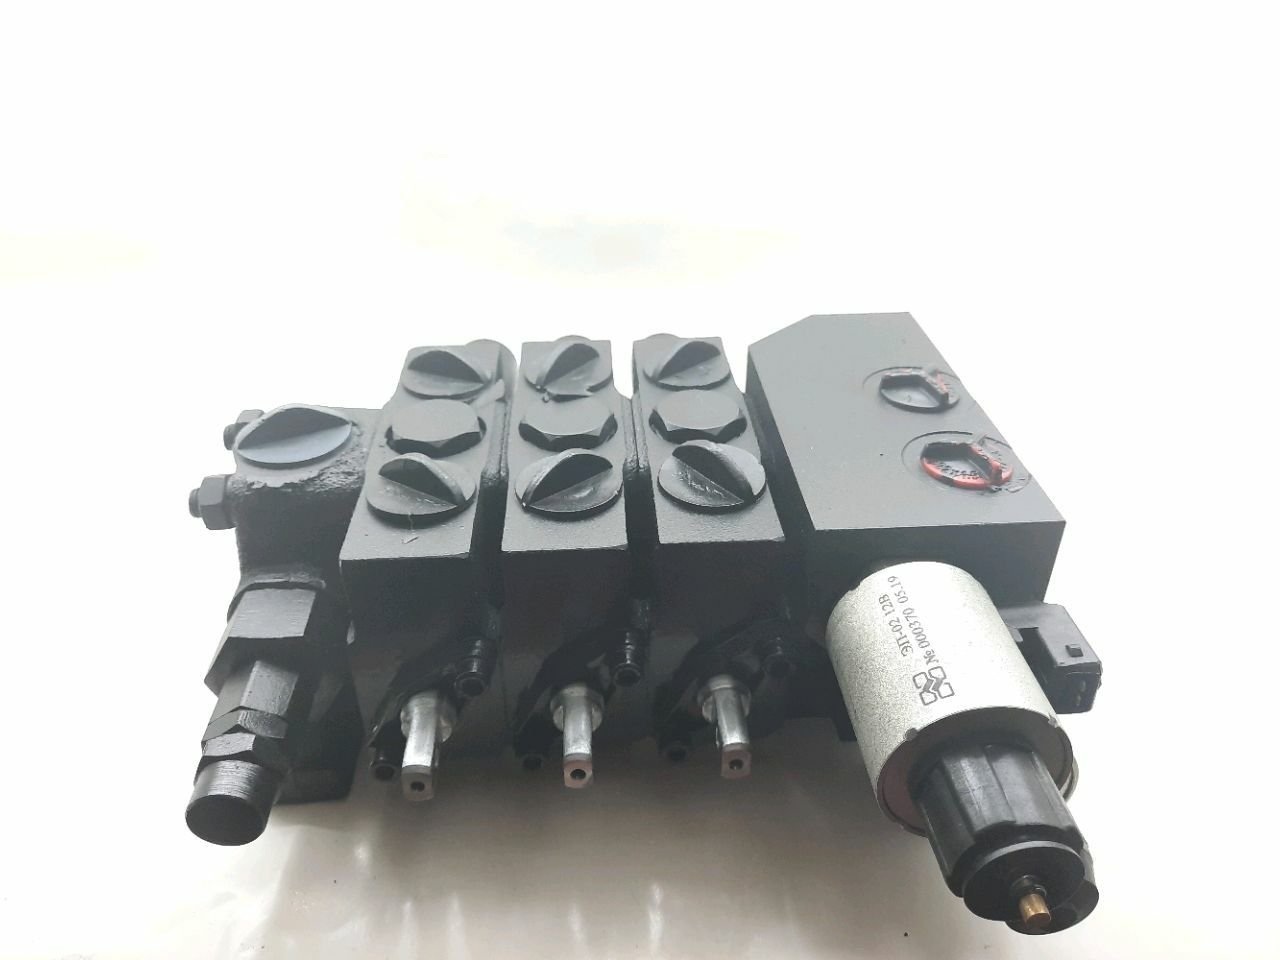 Distribuitor hidraulic RGR70/3 AC (RP70-1523.1)